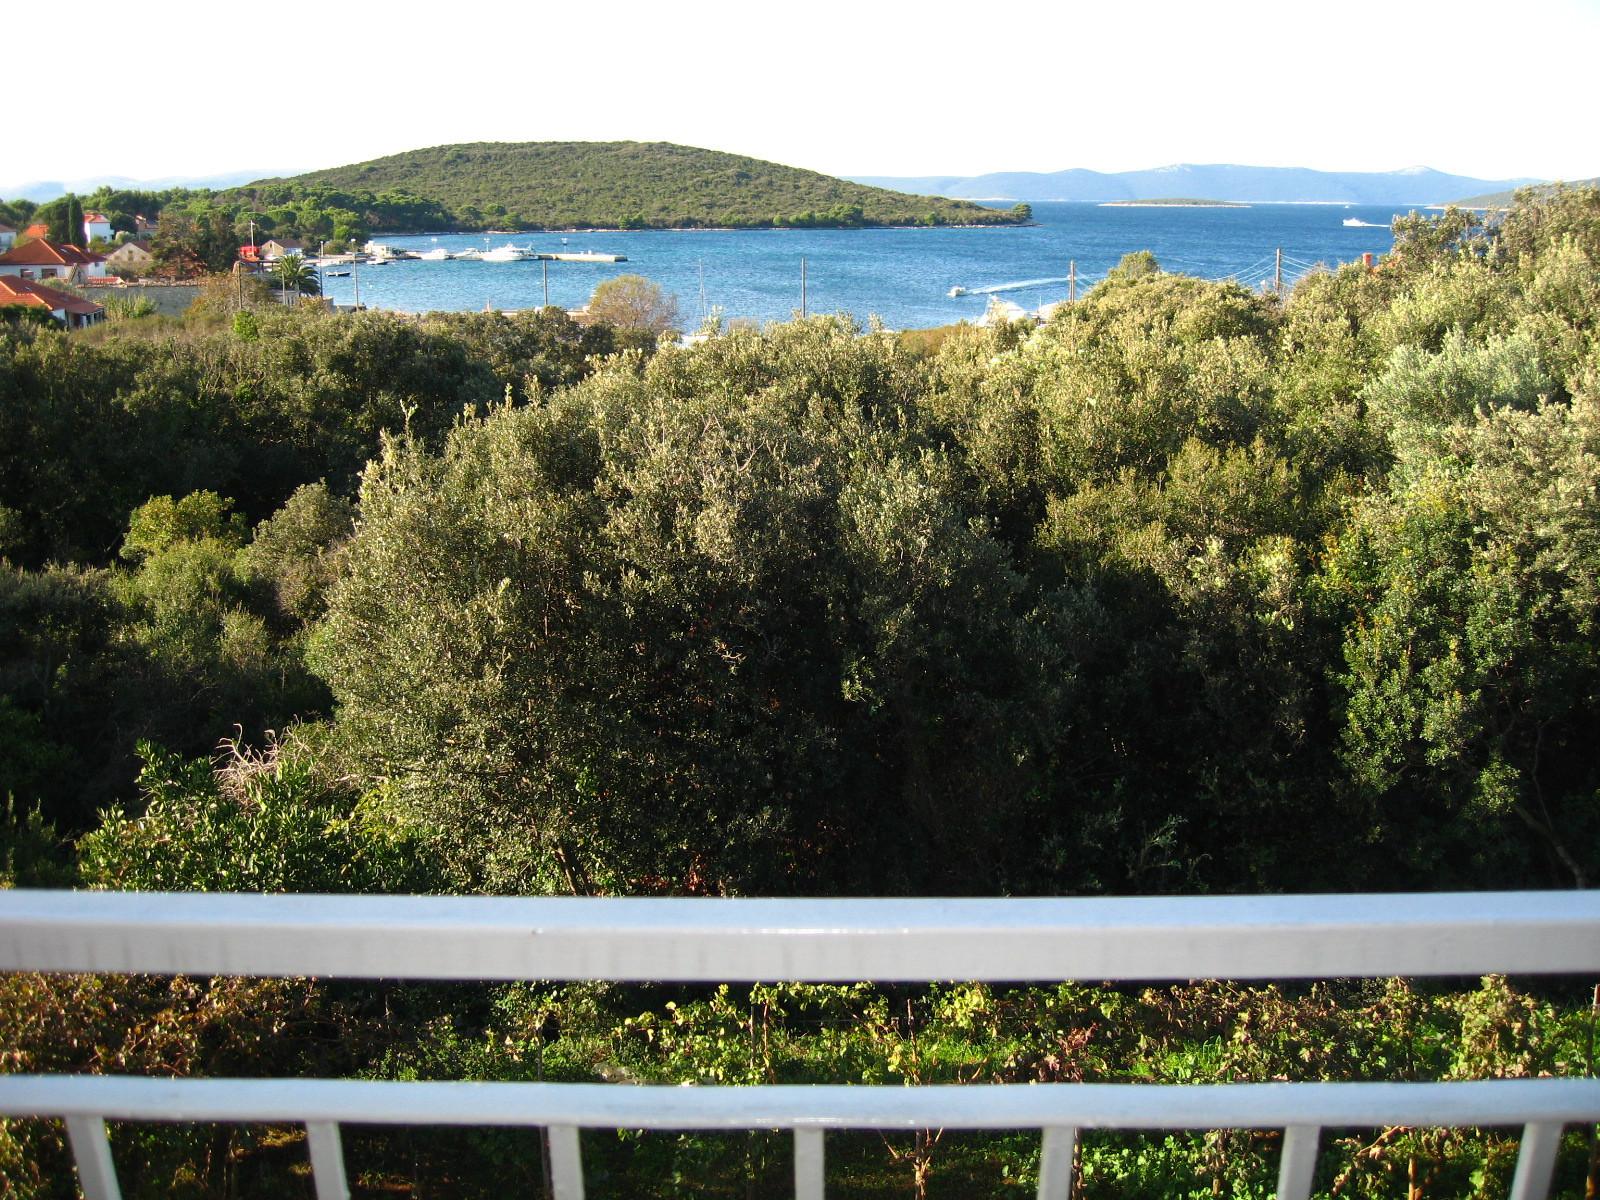 Ferienwohnung RL A3(4) - Muline (741843), Ugljan, Insel Ugljan, Dalmatien, Kroatien, Bild 6